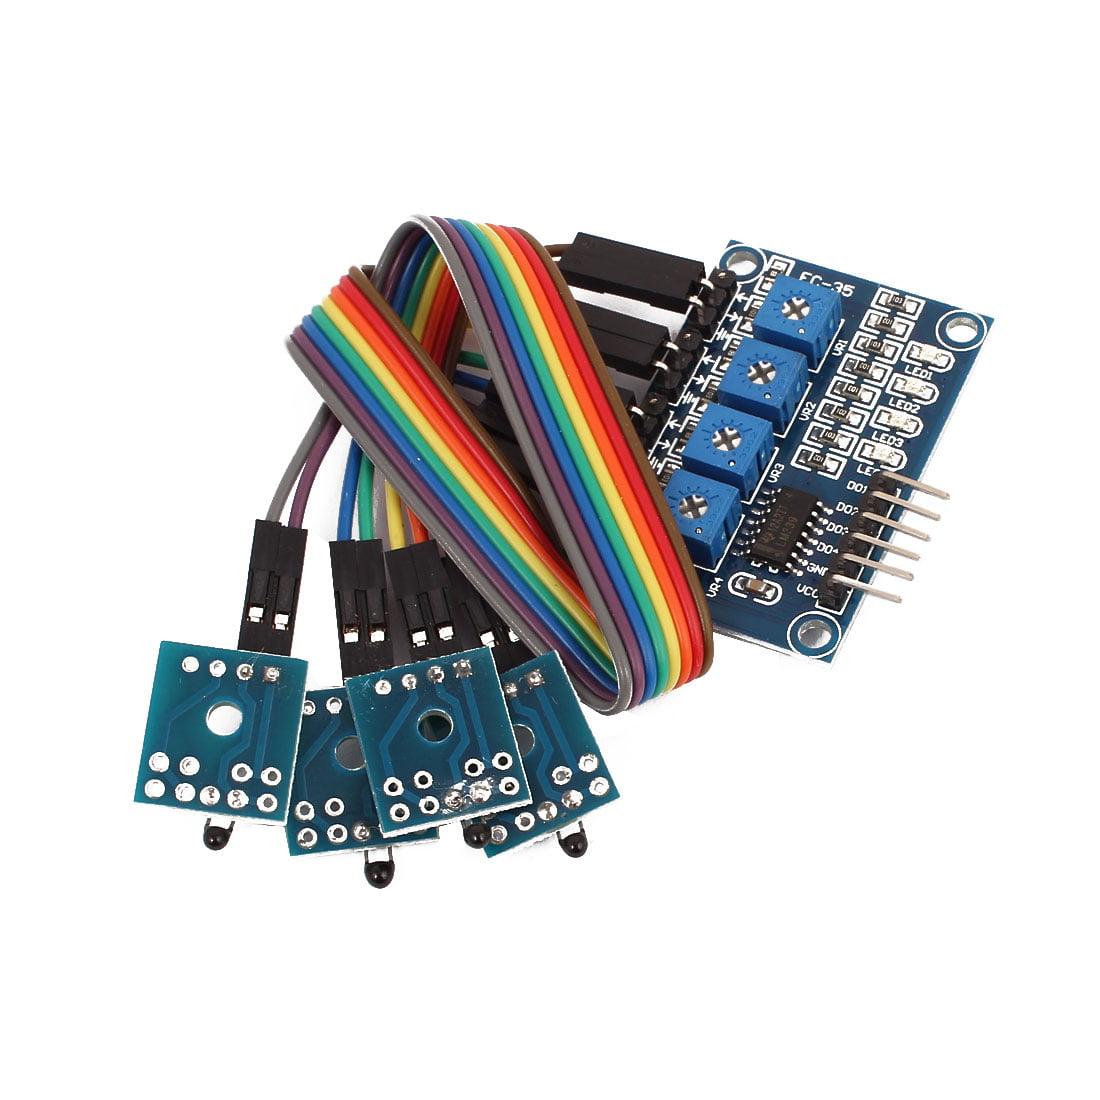 Hall Sensor  4-Way Switch Speed Counting Module - image 3 de 3